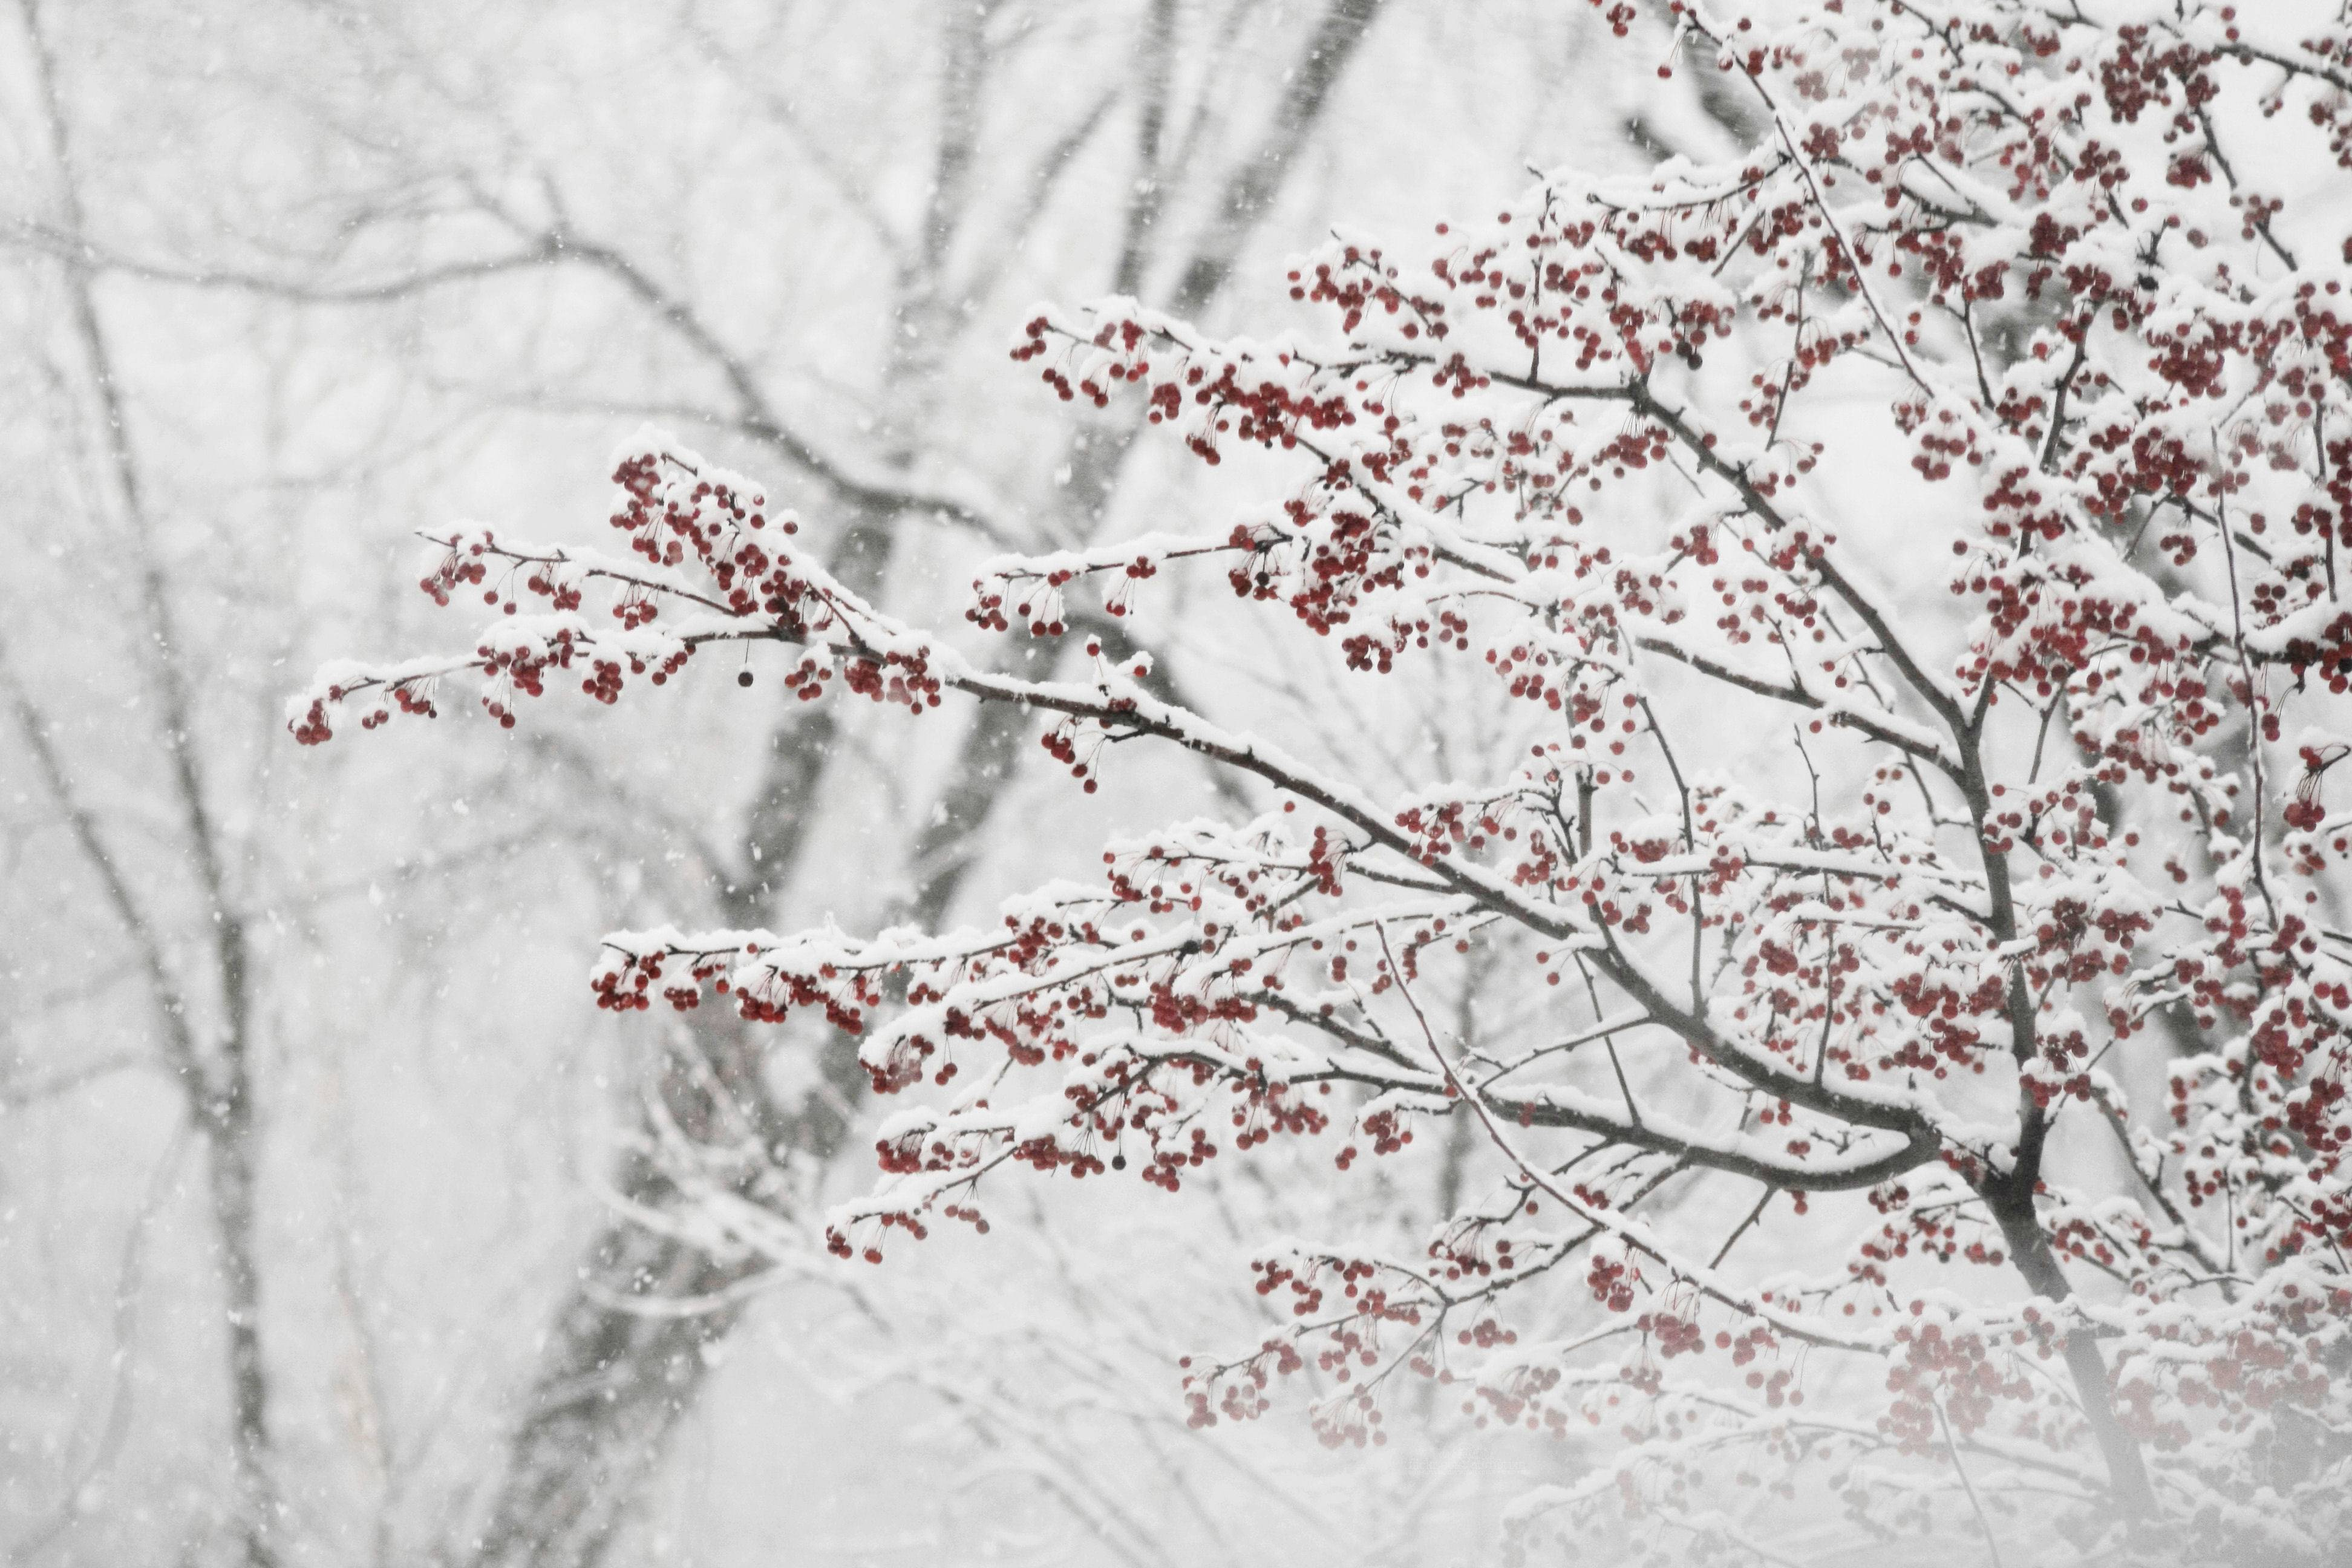 Snow Storm Wallpapers Wallpaper Cave